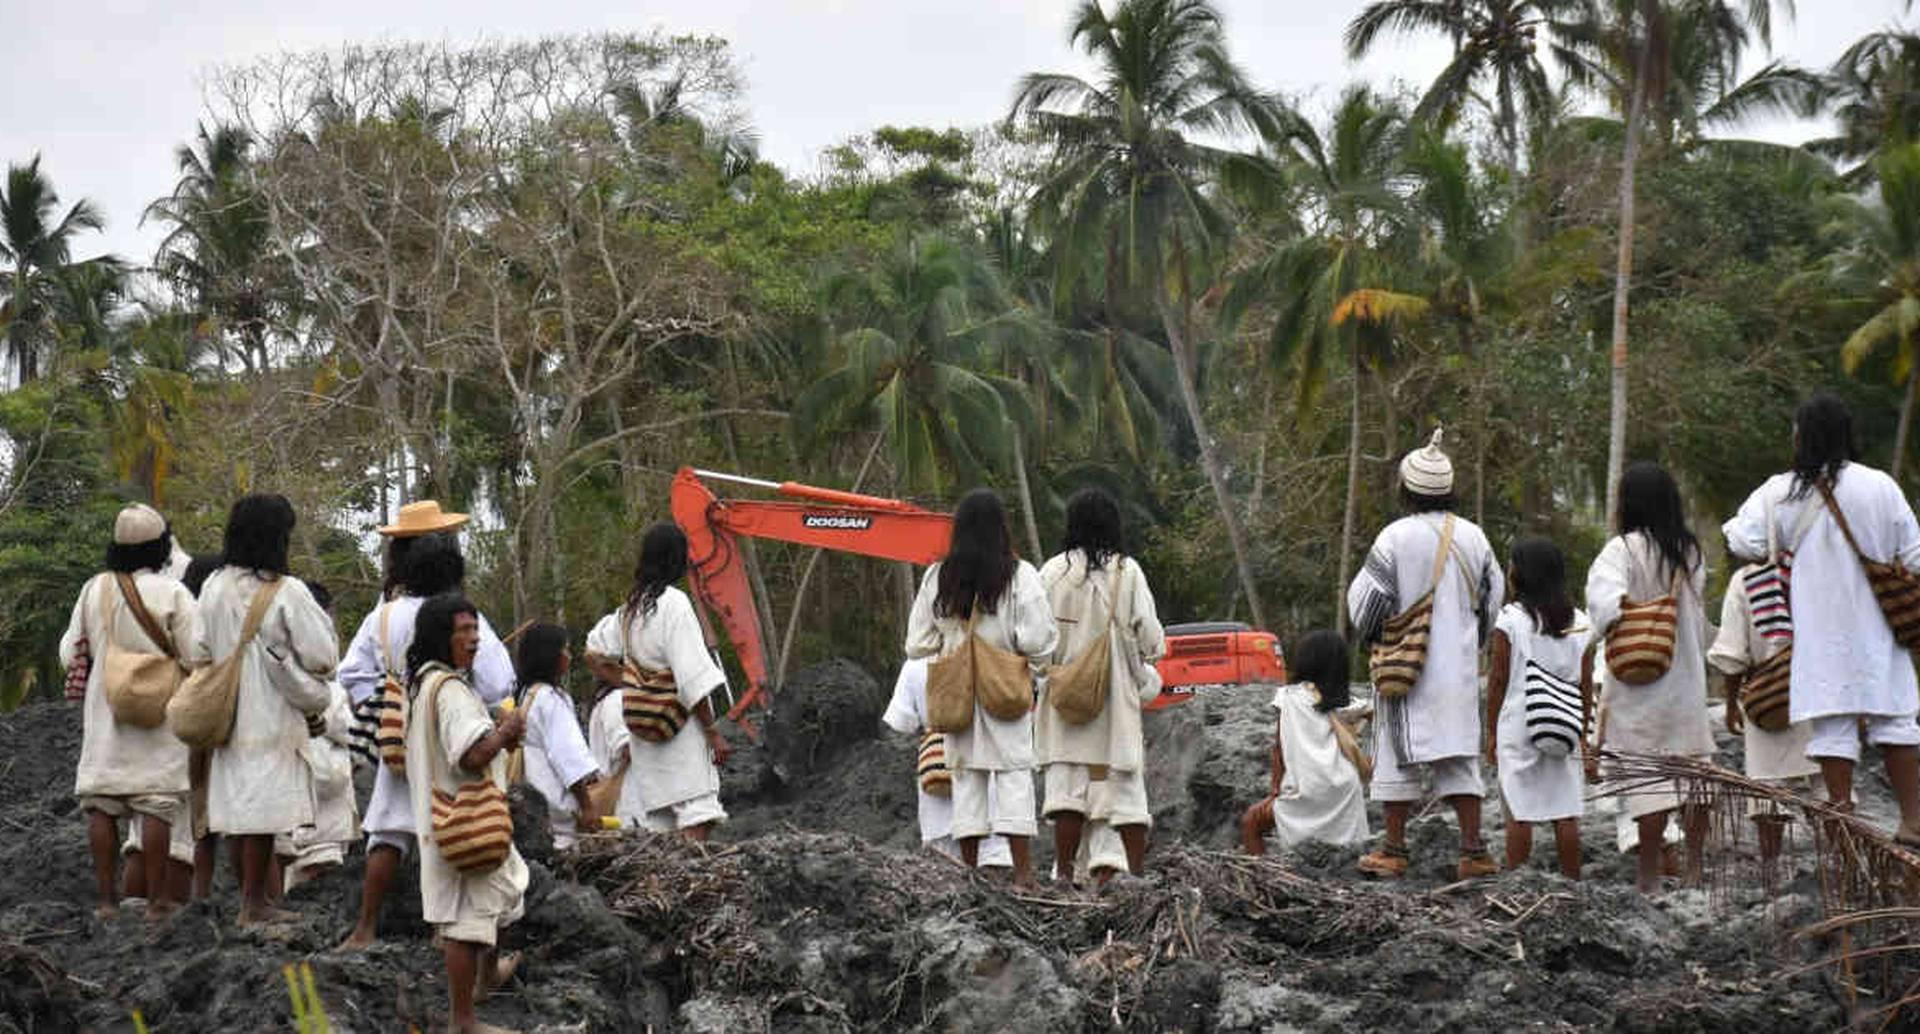 Tribunal de Cundinamarca ordenó a Duque entregar ayudas para indígenas